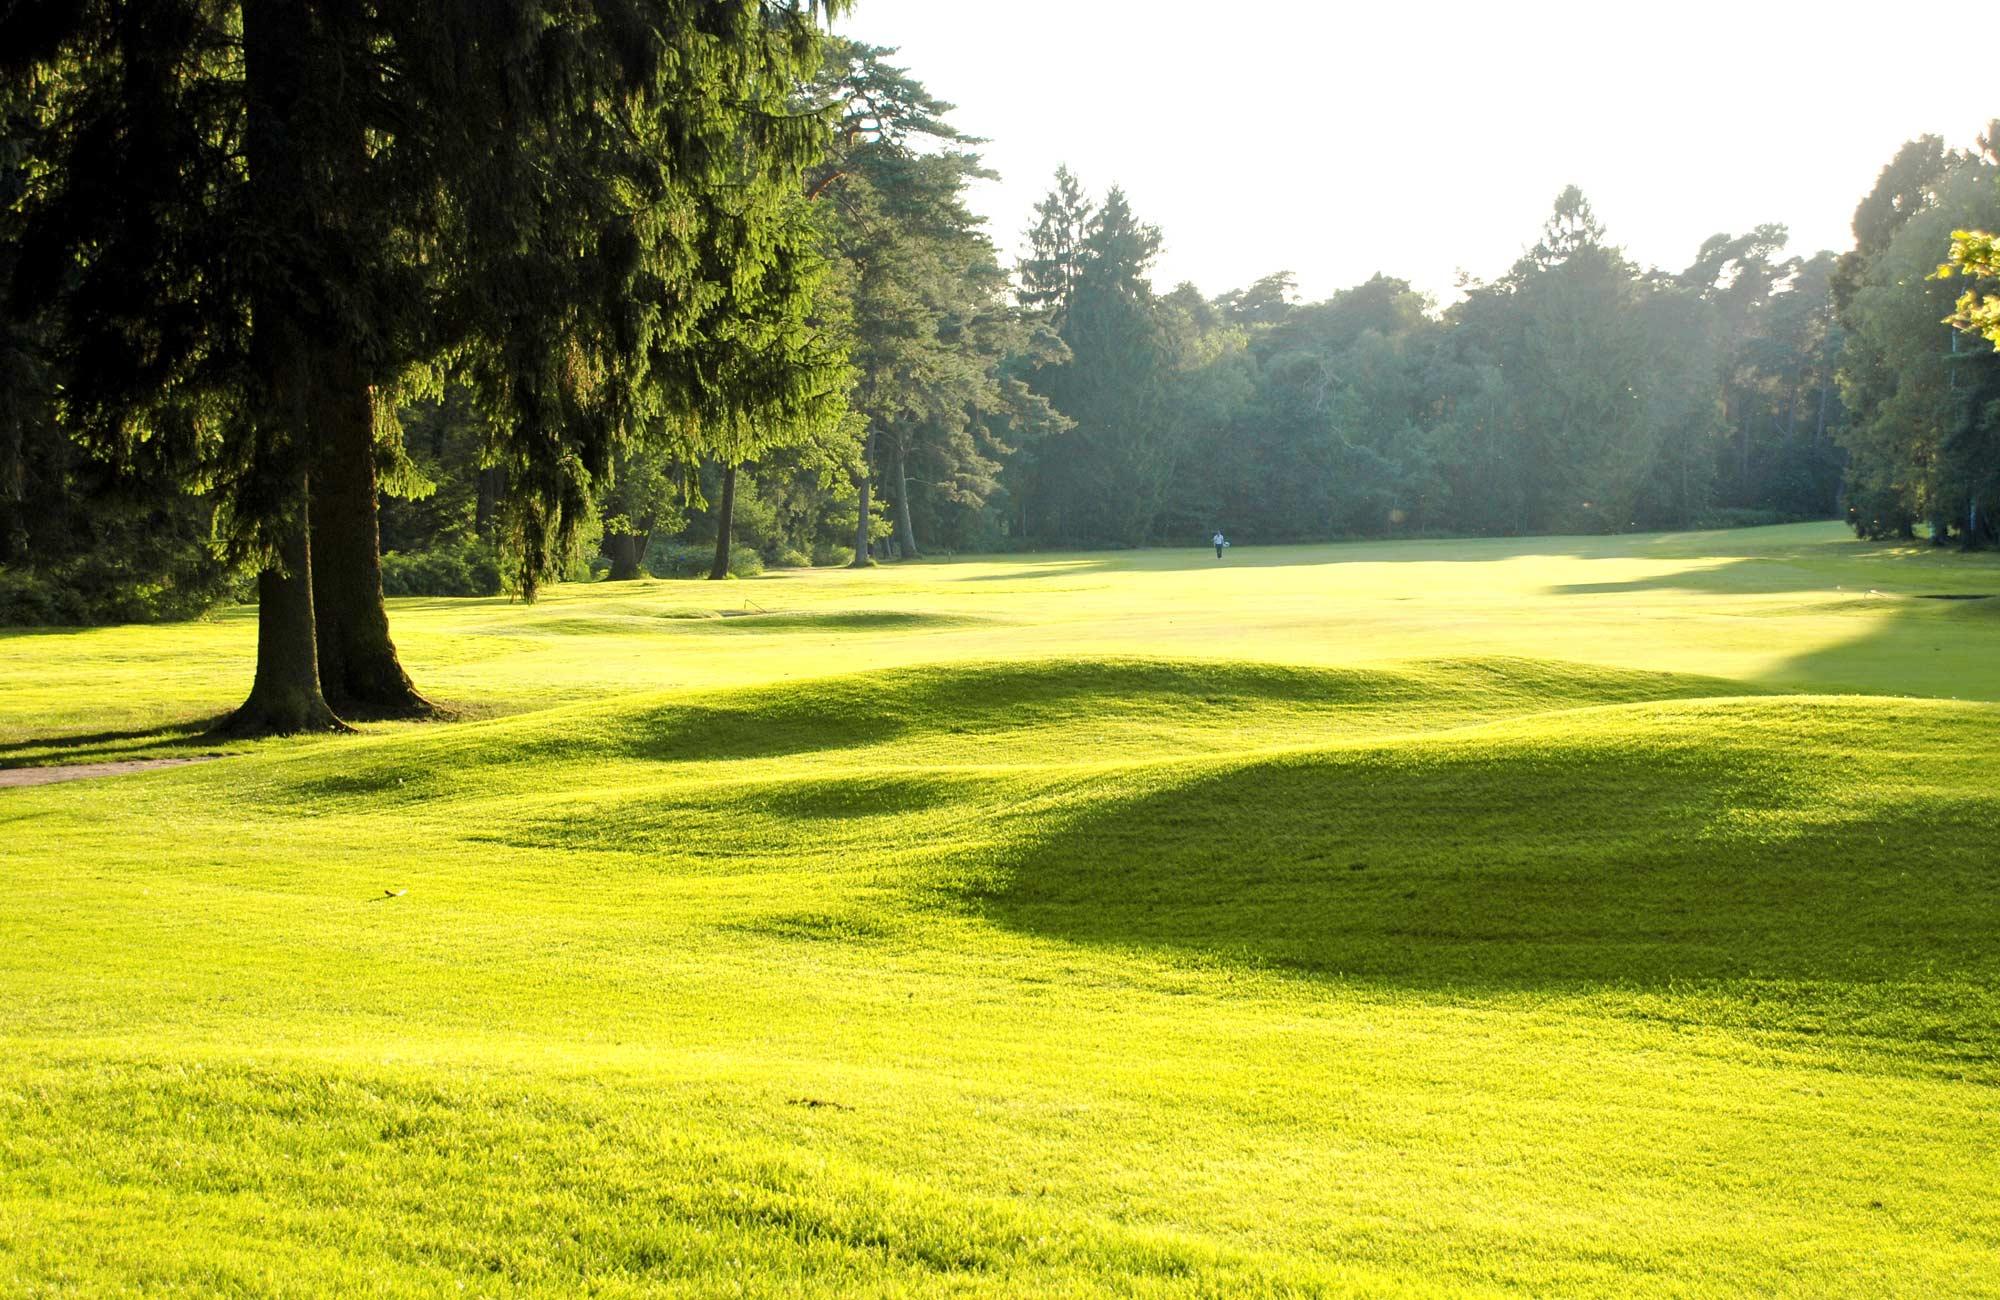 Golf- & Landclub Köln, der Golfplatz